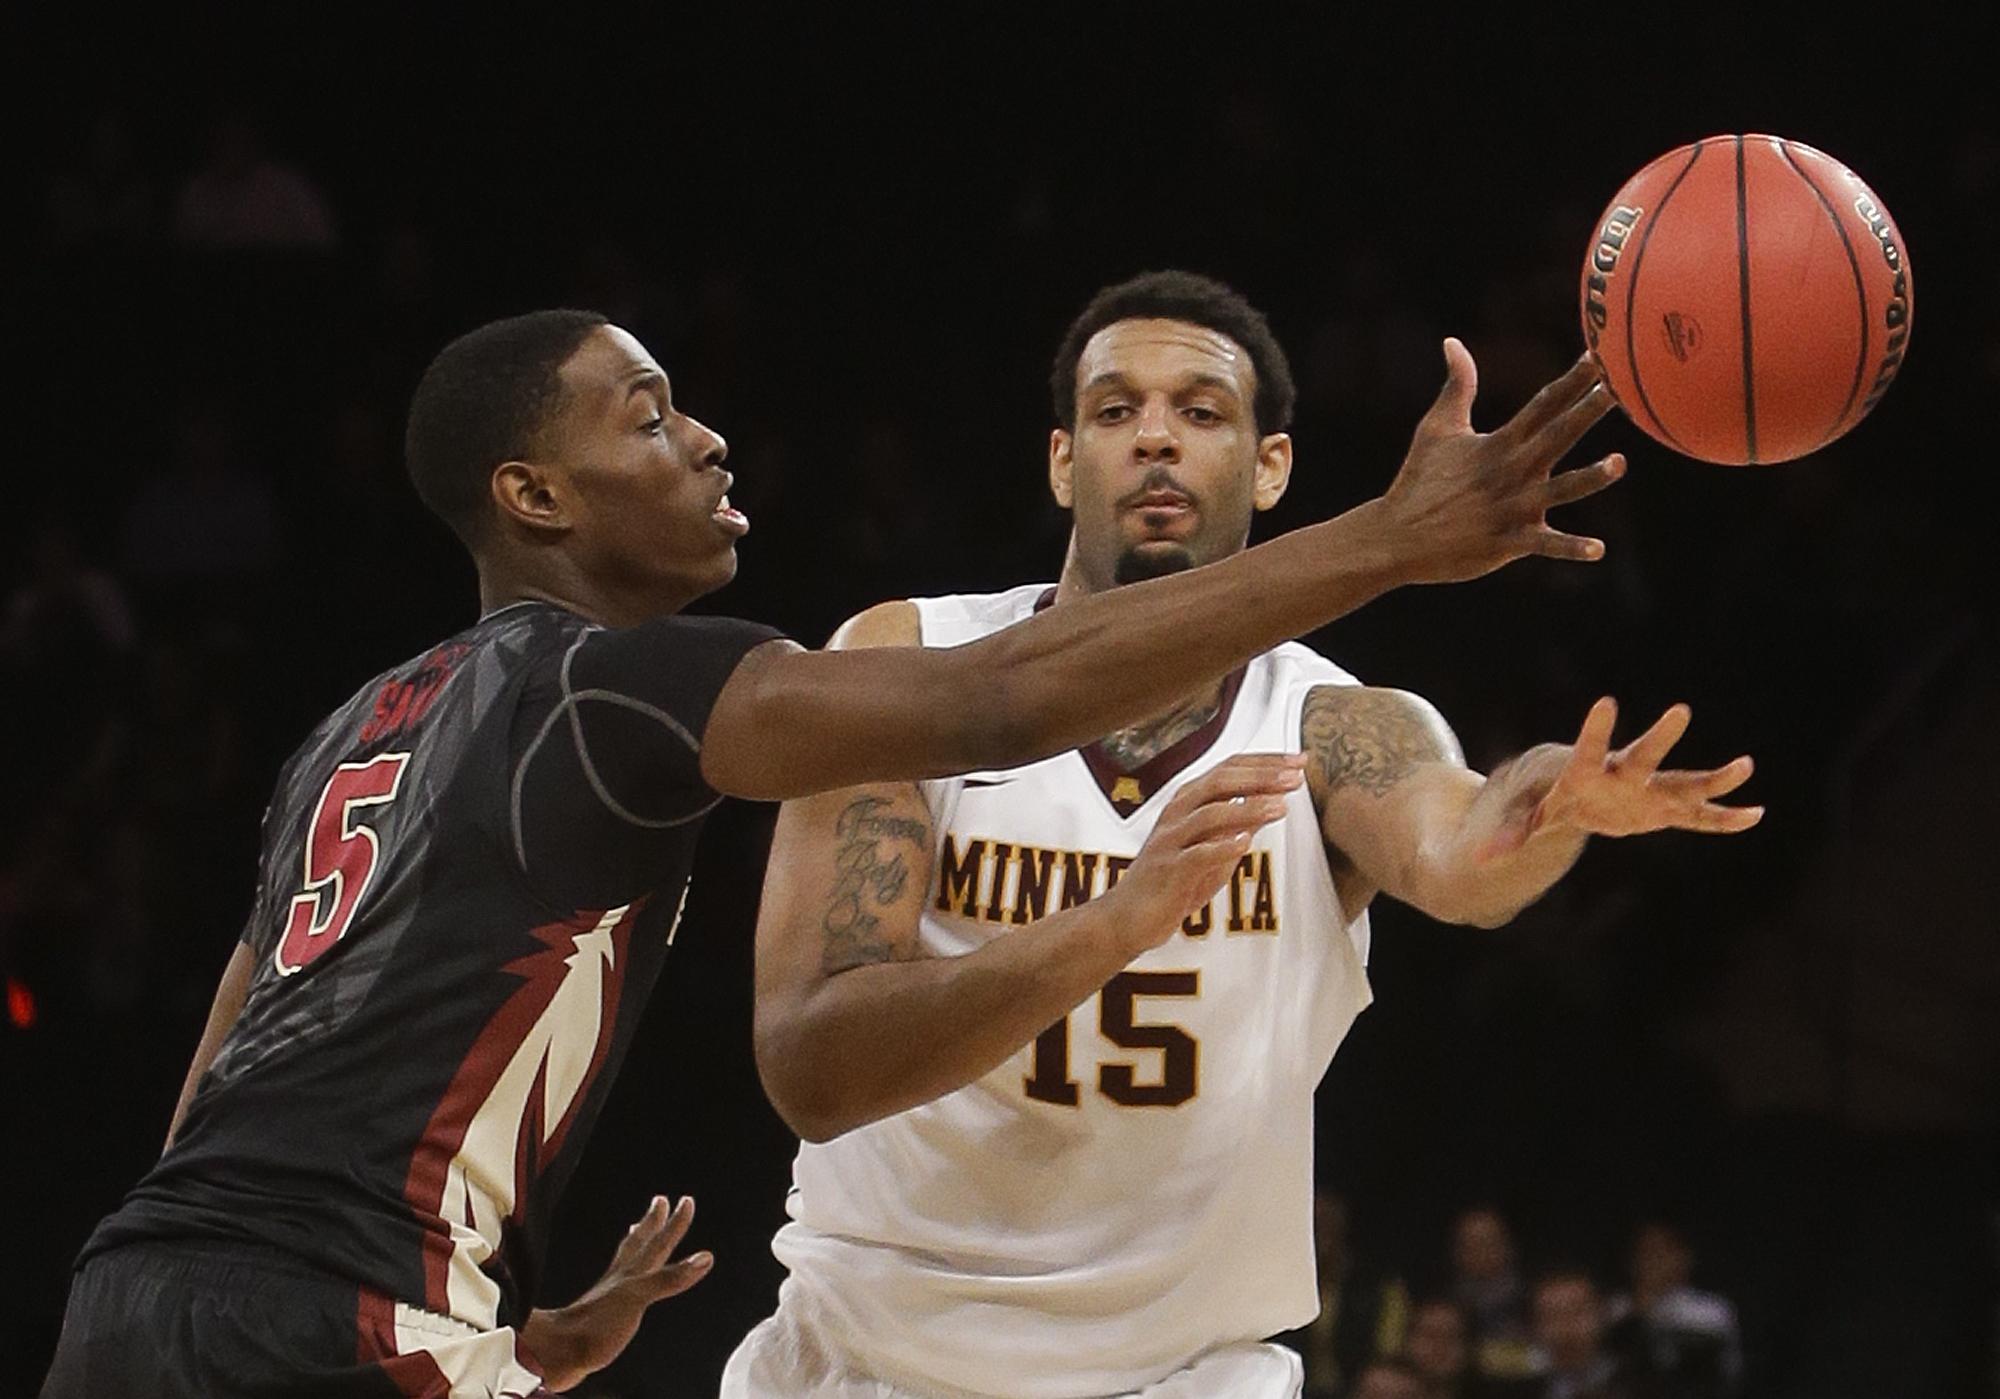 Minnesota beats Florida State 67-64 in OT at NIT